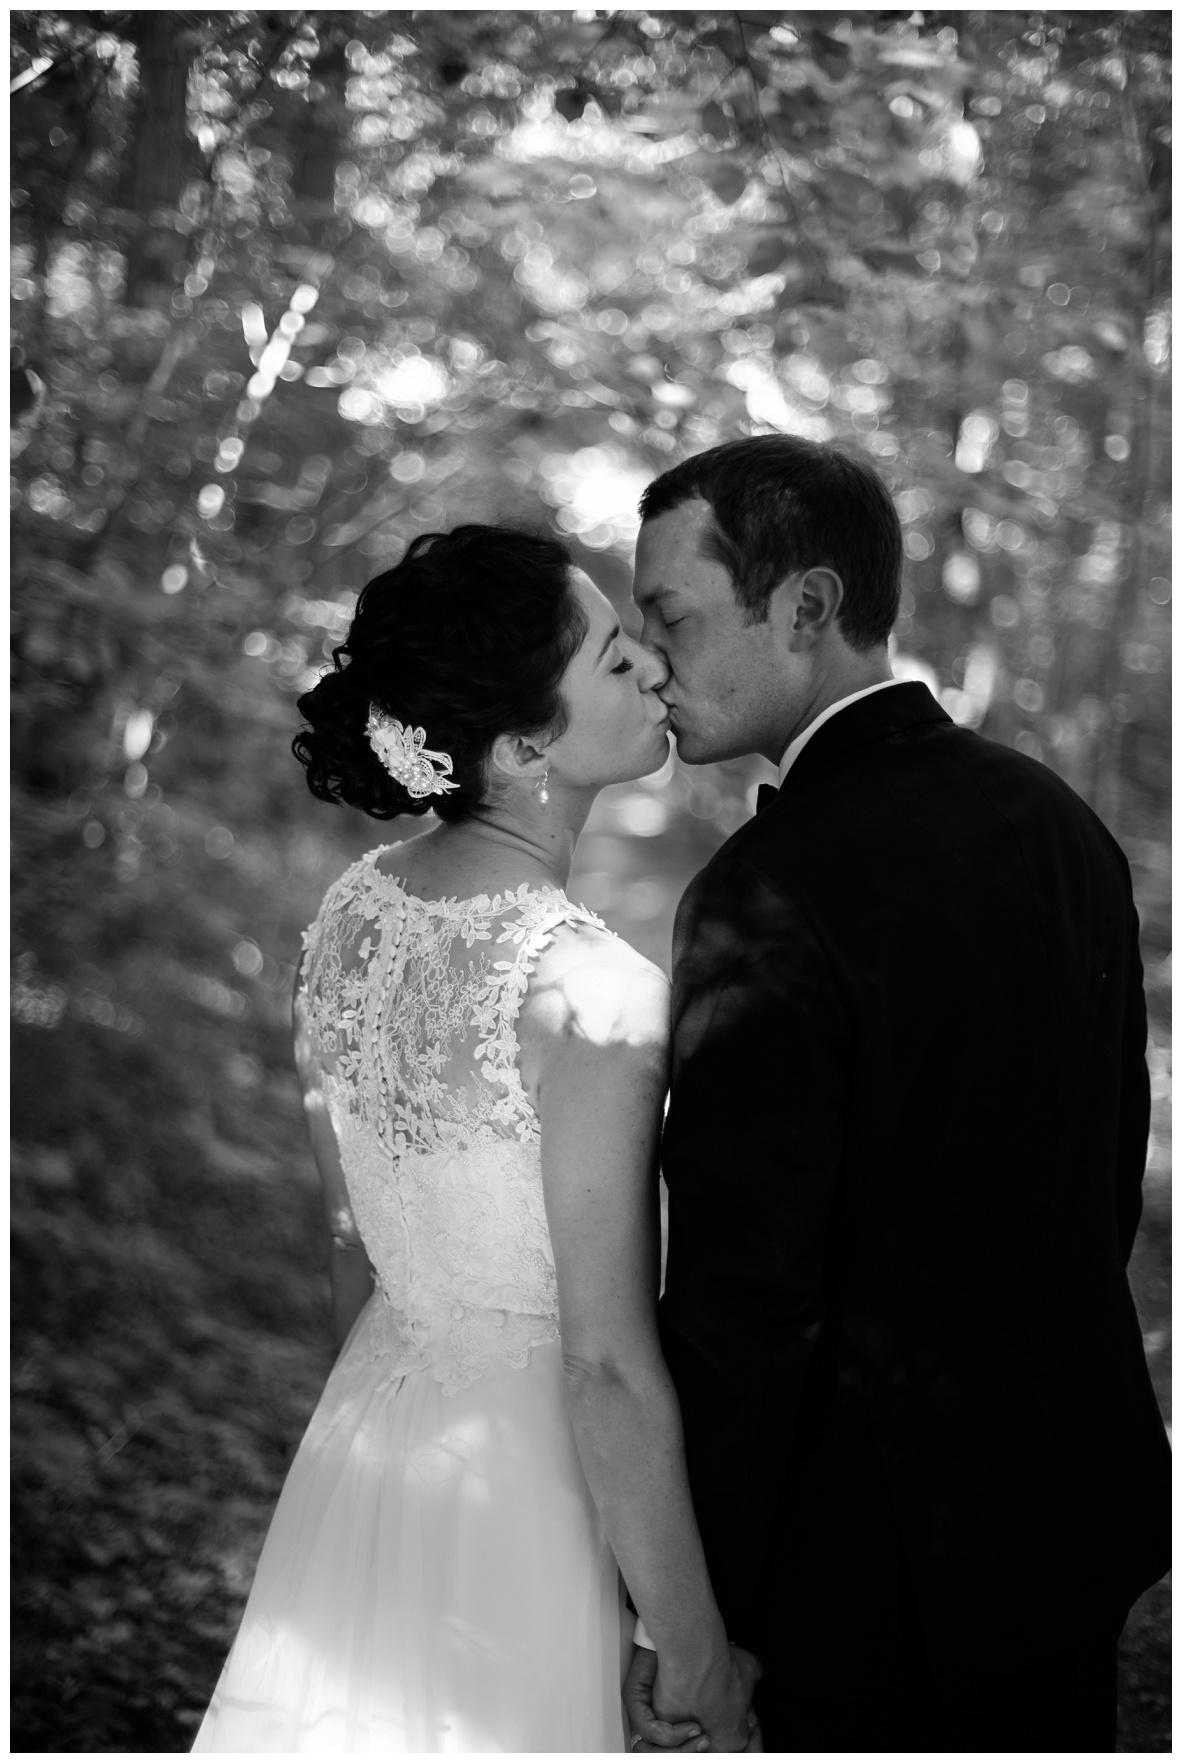 The Wedding of Danielle and Matt_0050.jpg